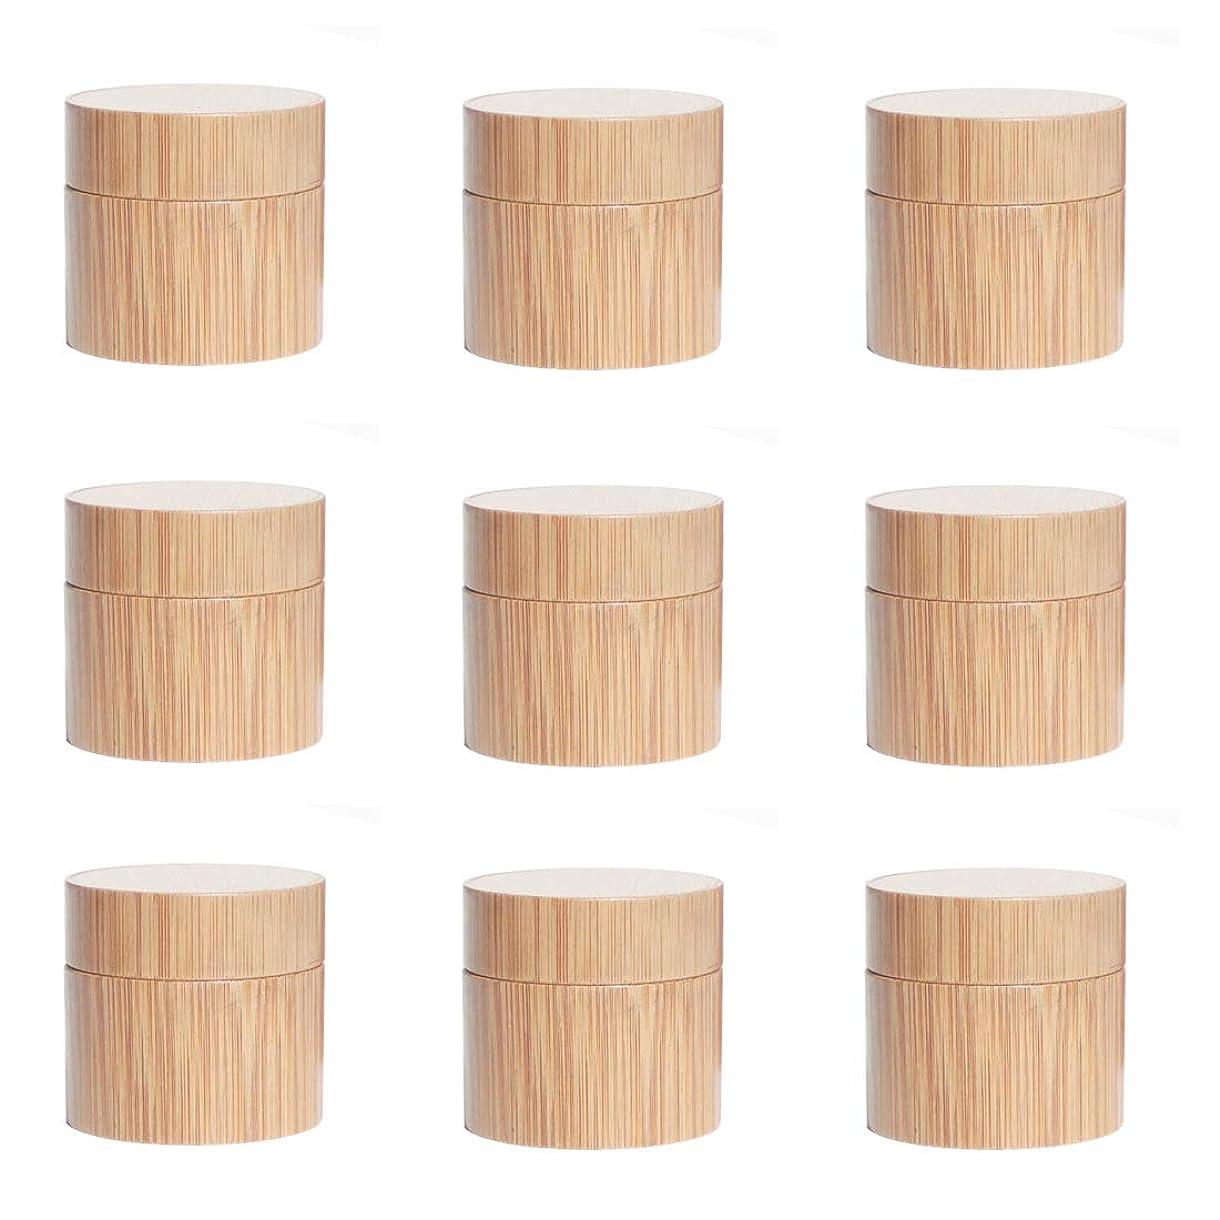 Yiteng スポイト遮光瓶 アロマオイル 精油 香水やアロマの保存 遮光瓶 小分け用 保存 詰替え 竹製 9本セット (10g)